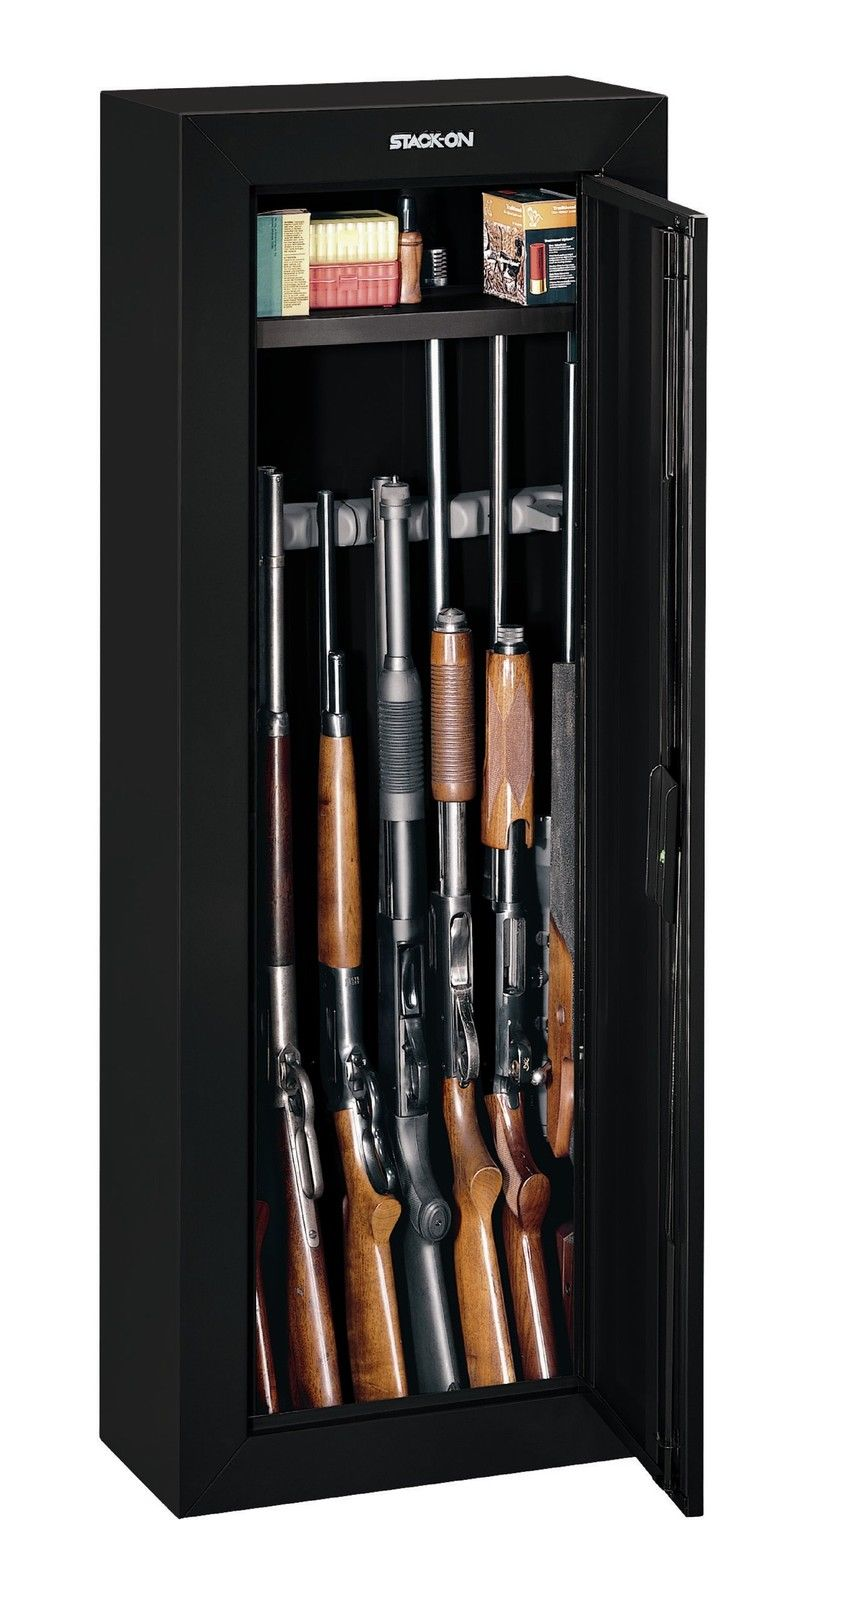 Kako održavati oružje nakon sezone; vir:: https://www.stack-on.com/